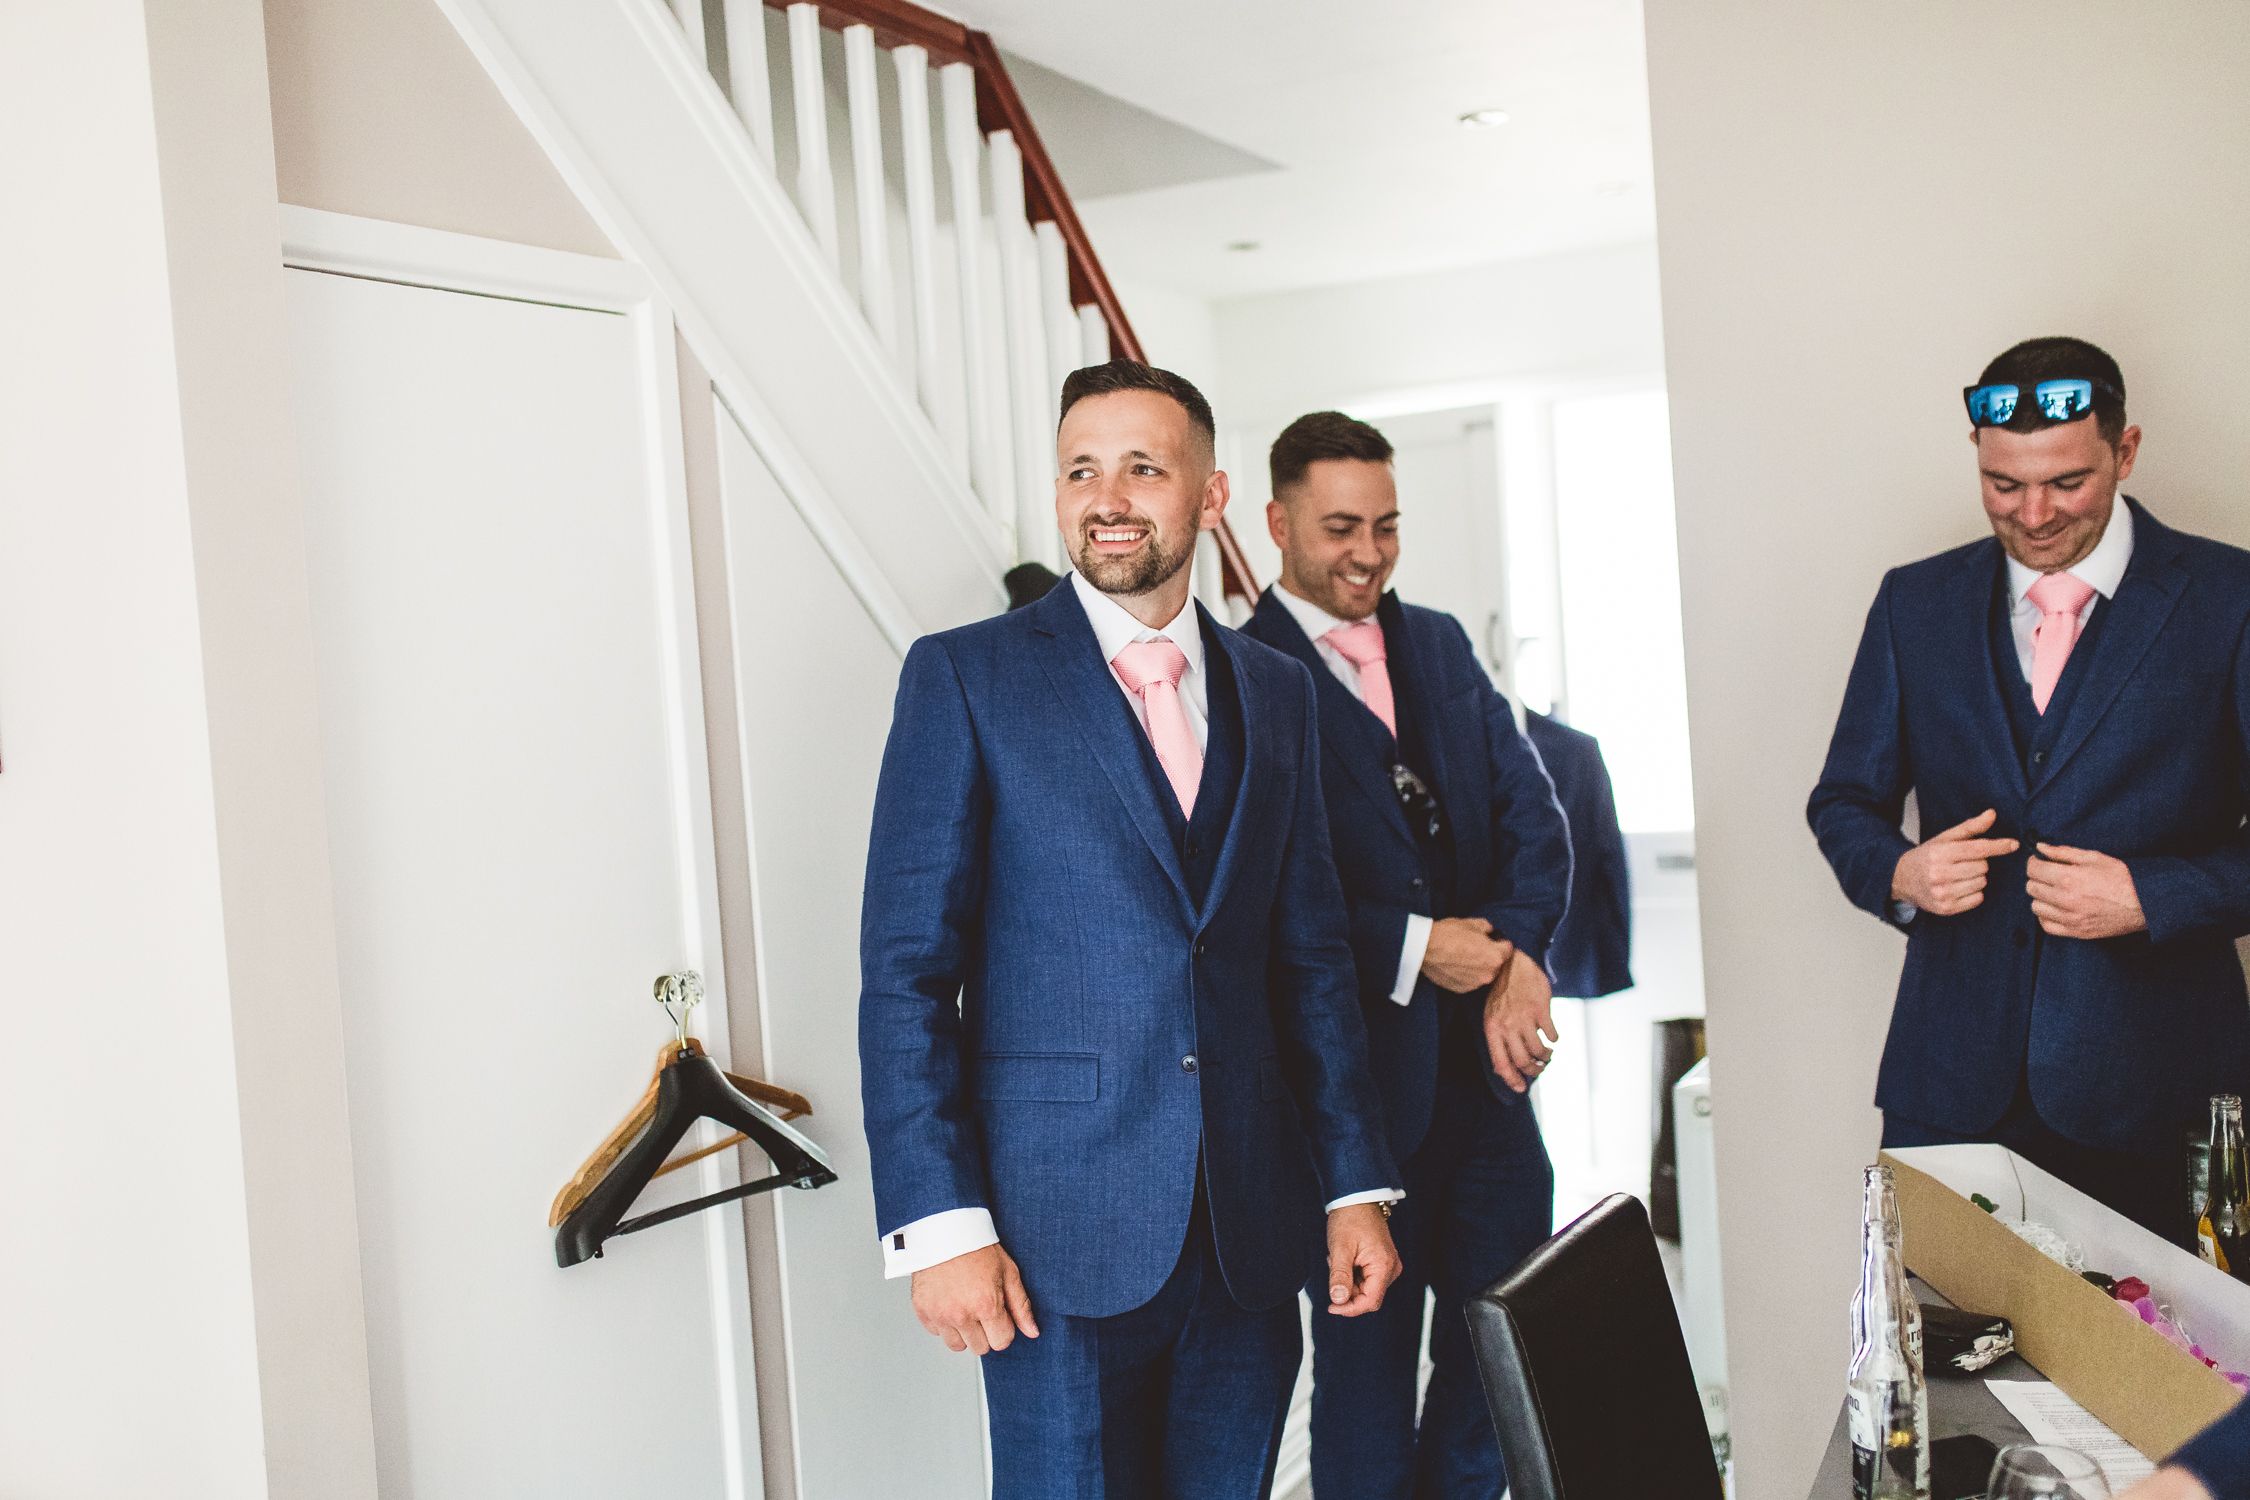 Tunbridge Wells Wedding Vilcinskaite Photo 3.jpg